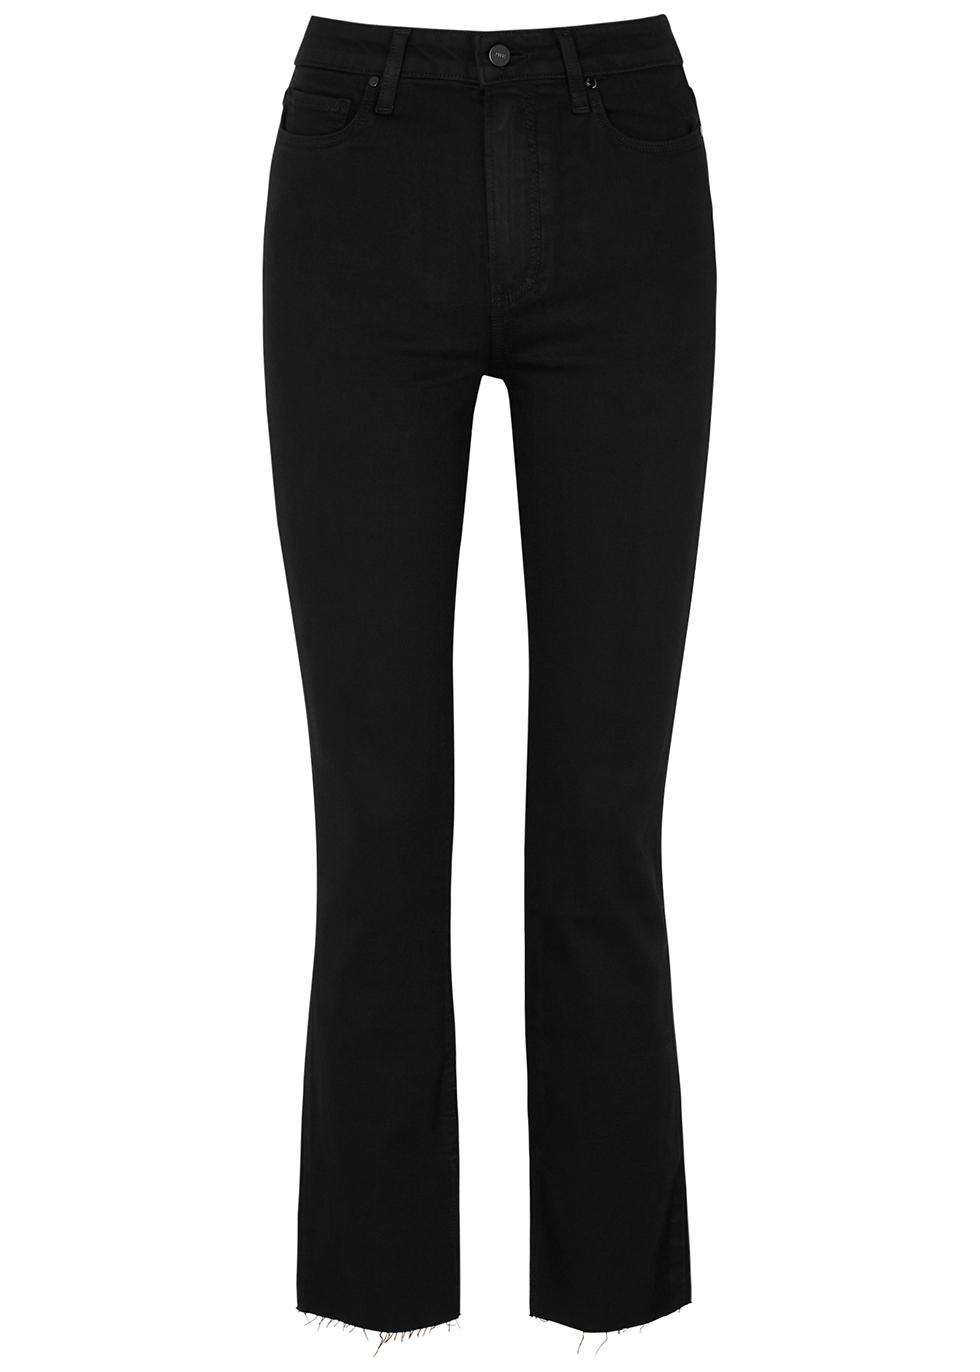 Cindy Transcend black straight-leg jeans